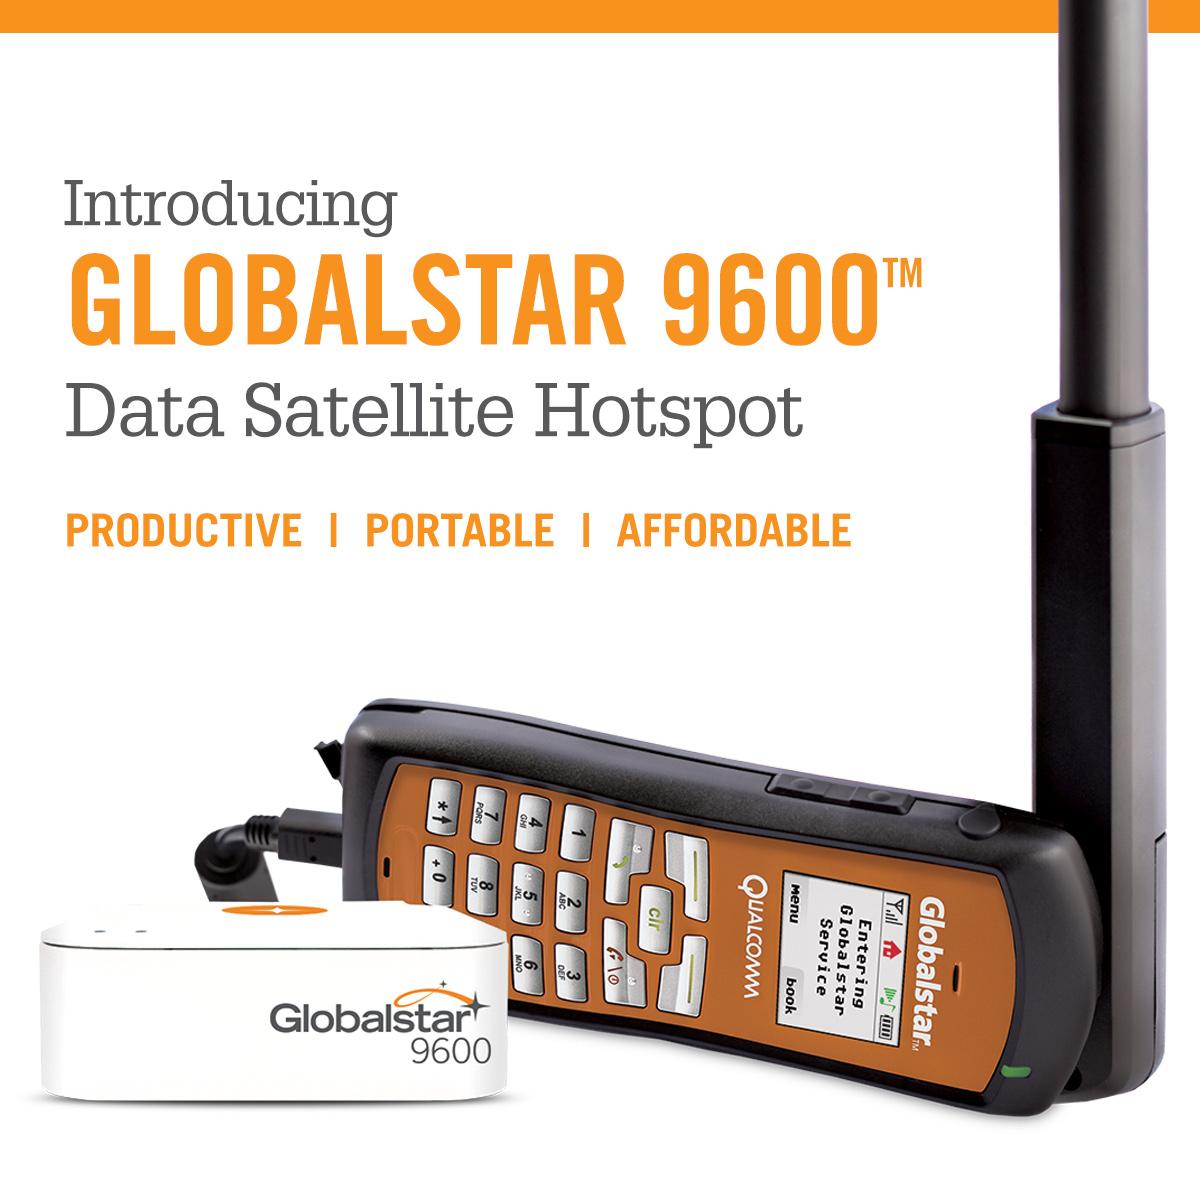 Globalstar 9600